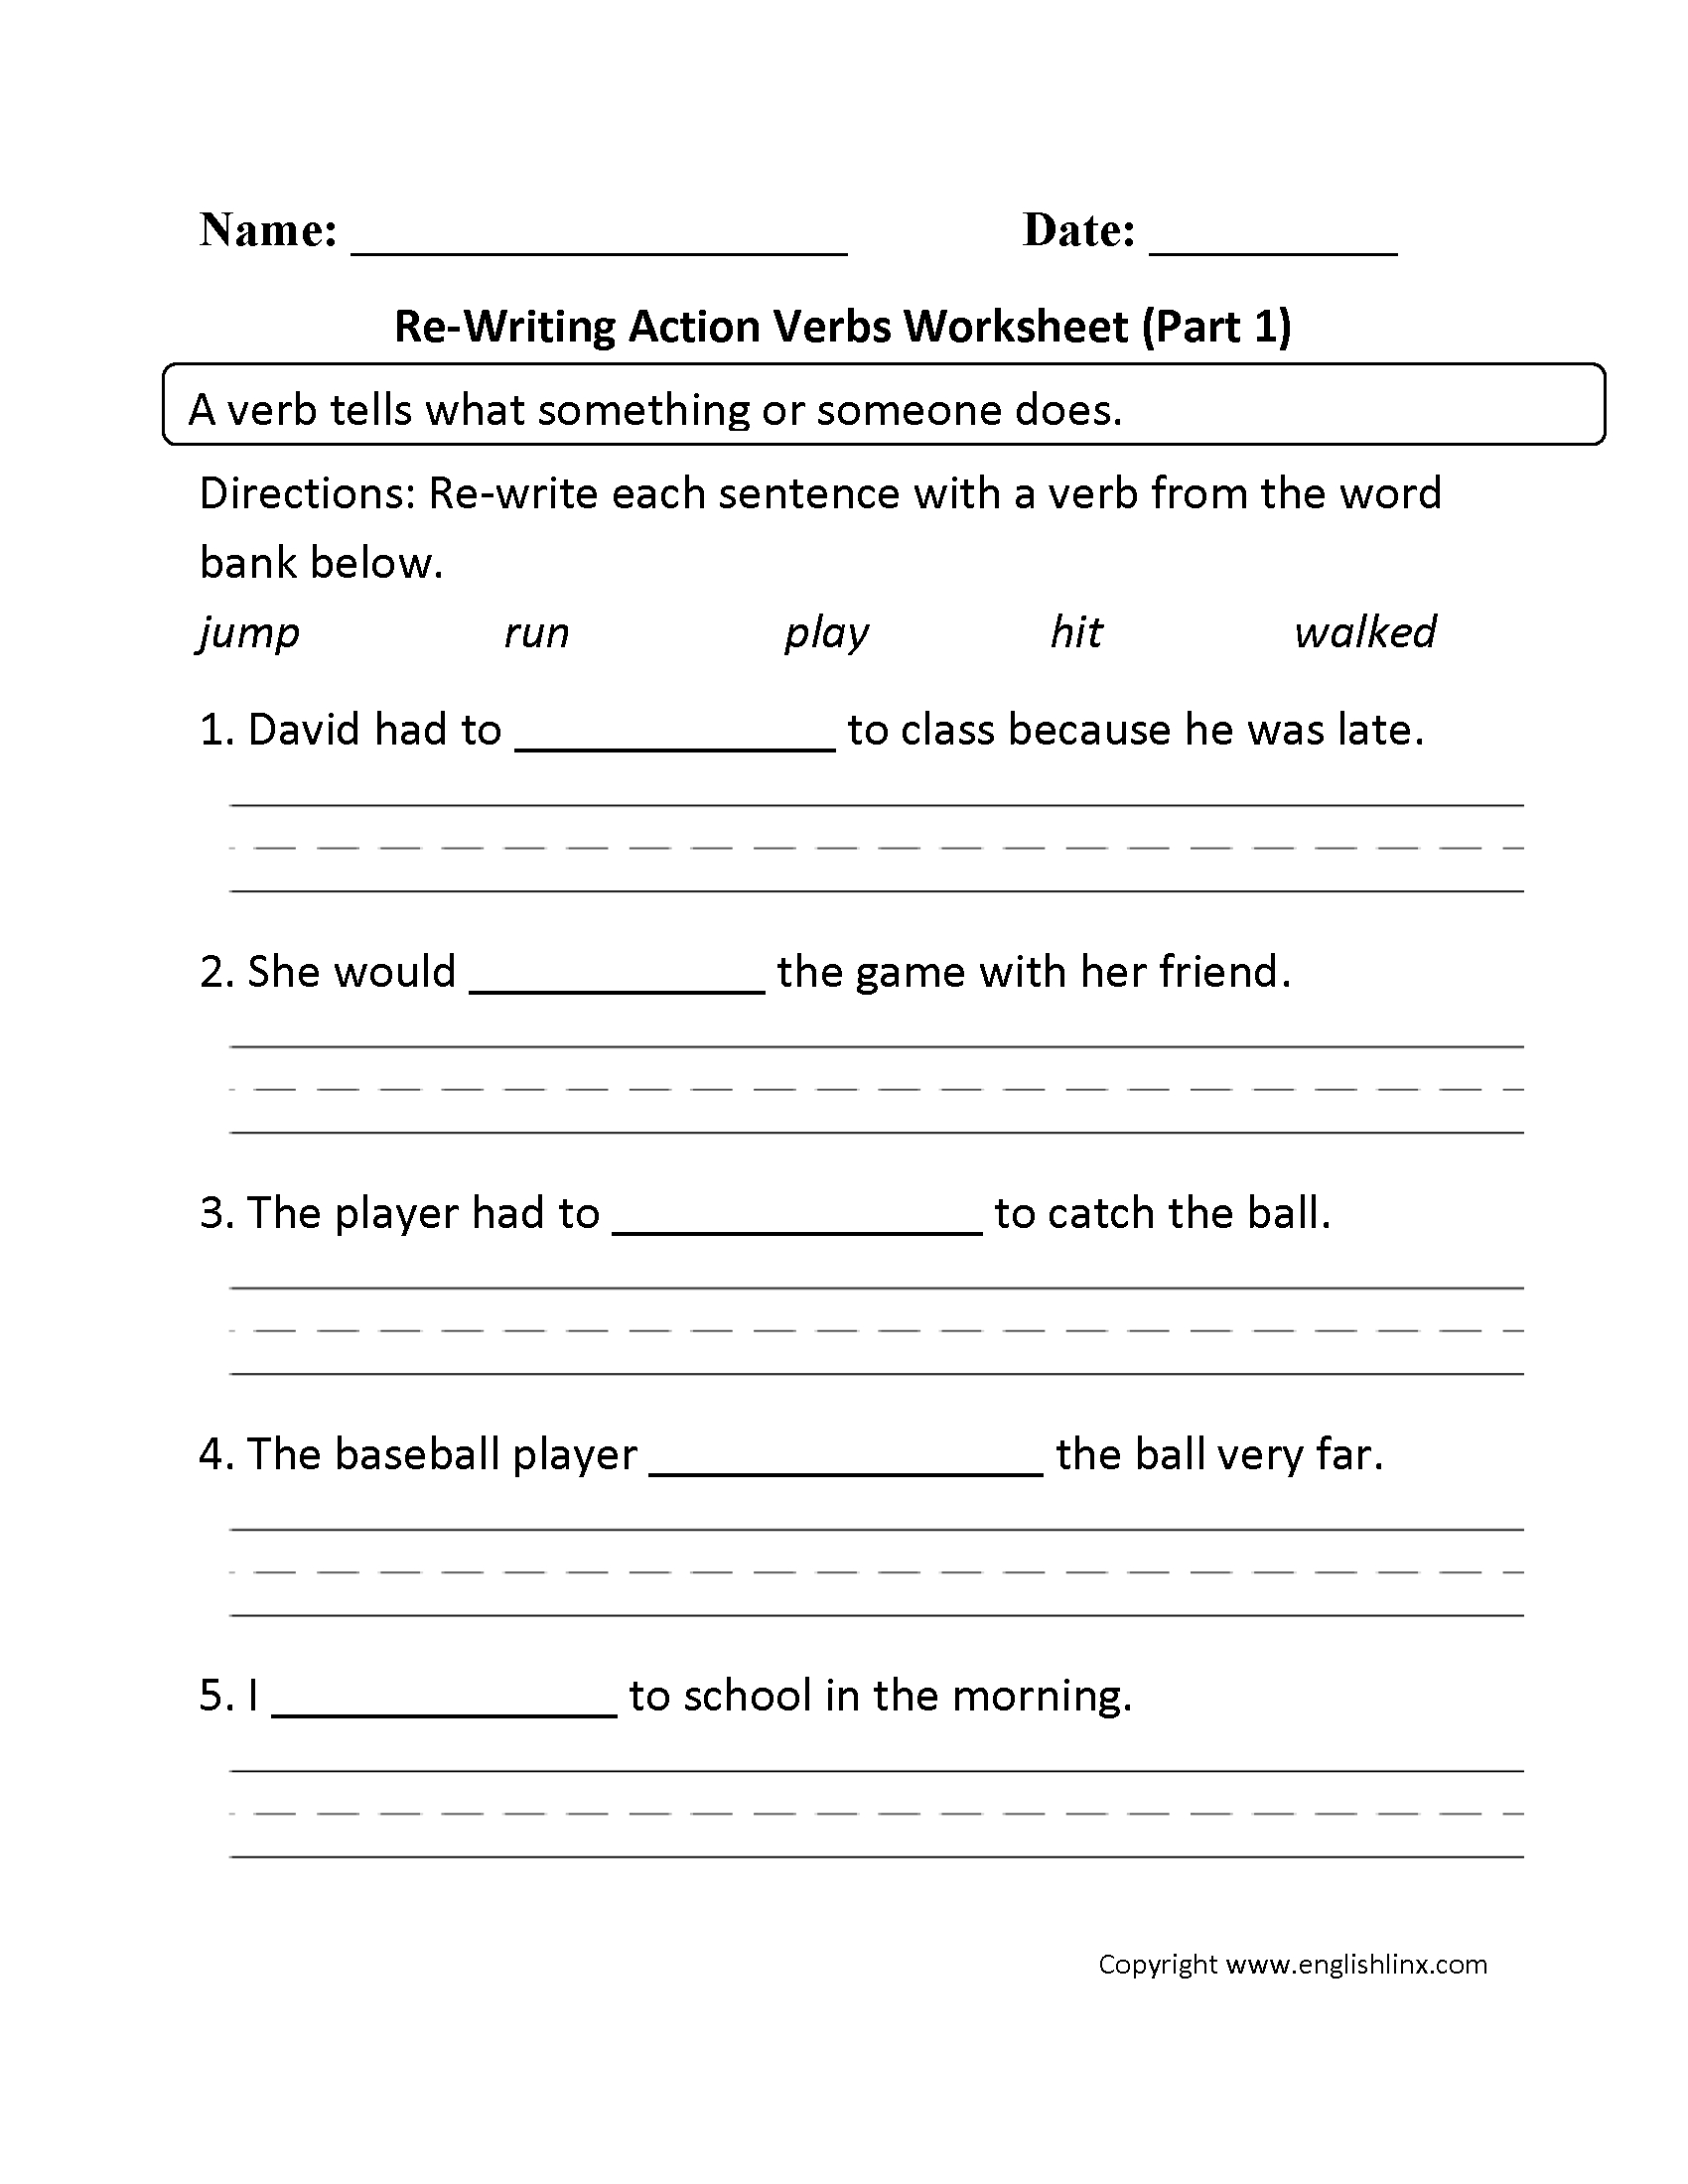 Free Printable Verbs And Nouns Worksheet For Kindergarten